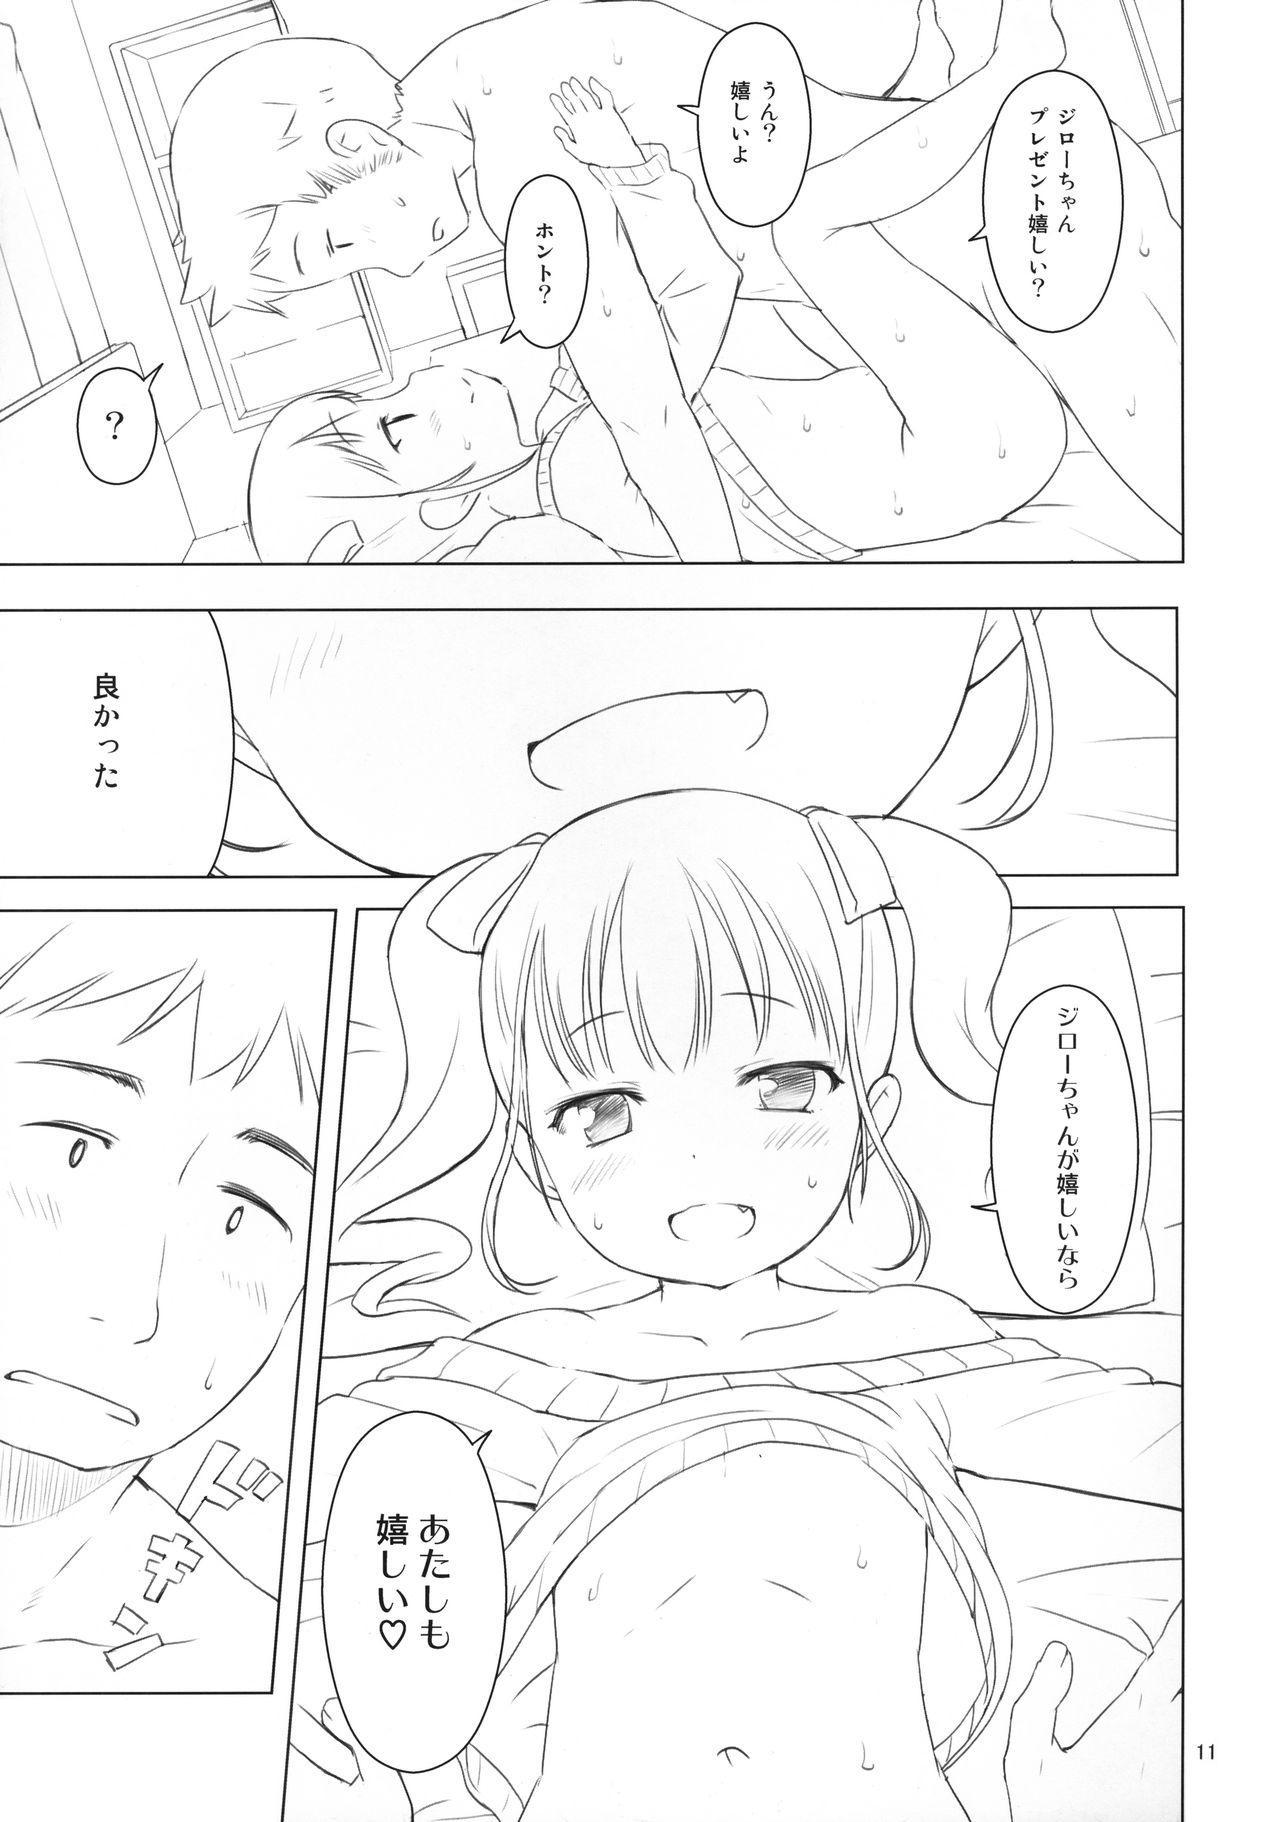 Fuyu no Ho San 10